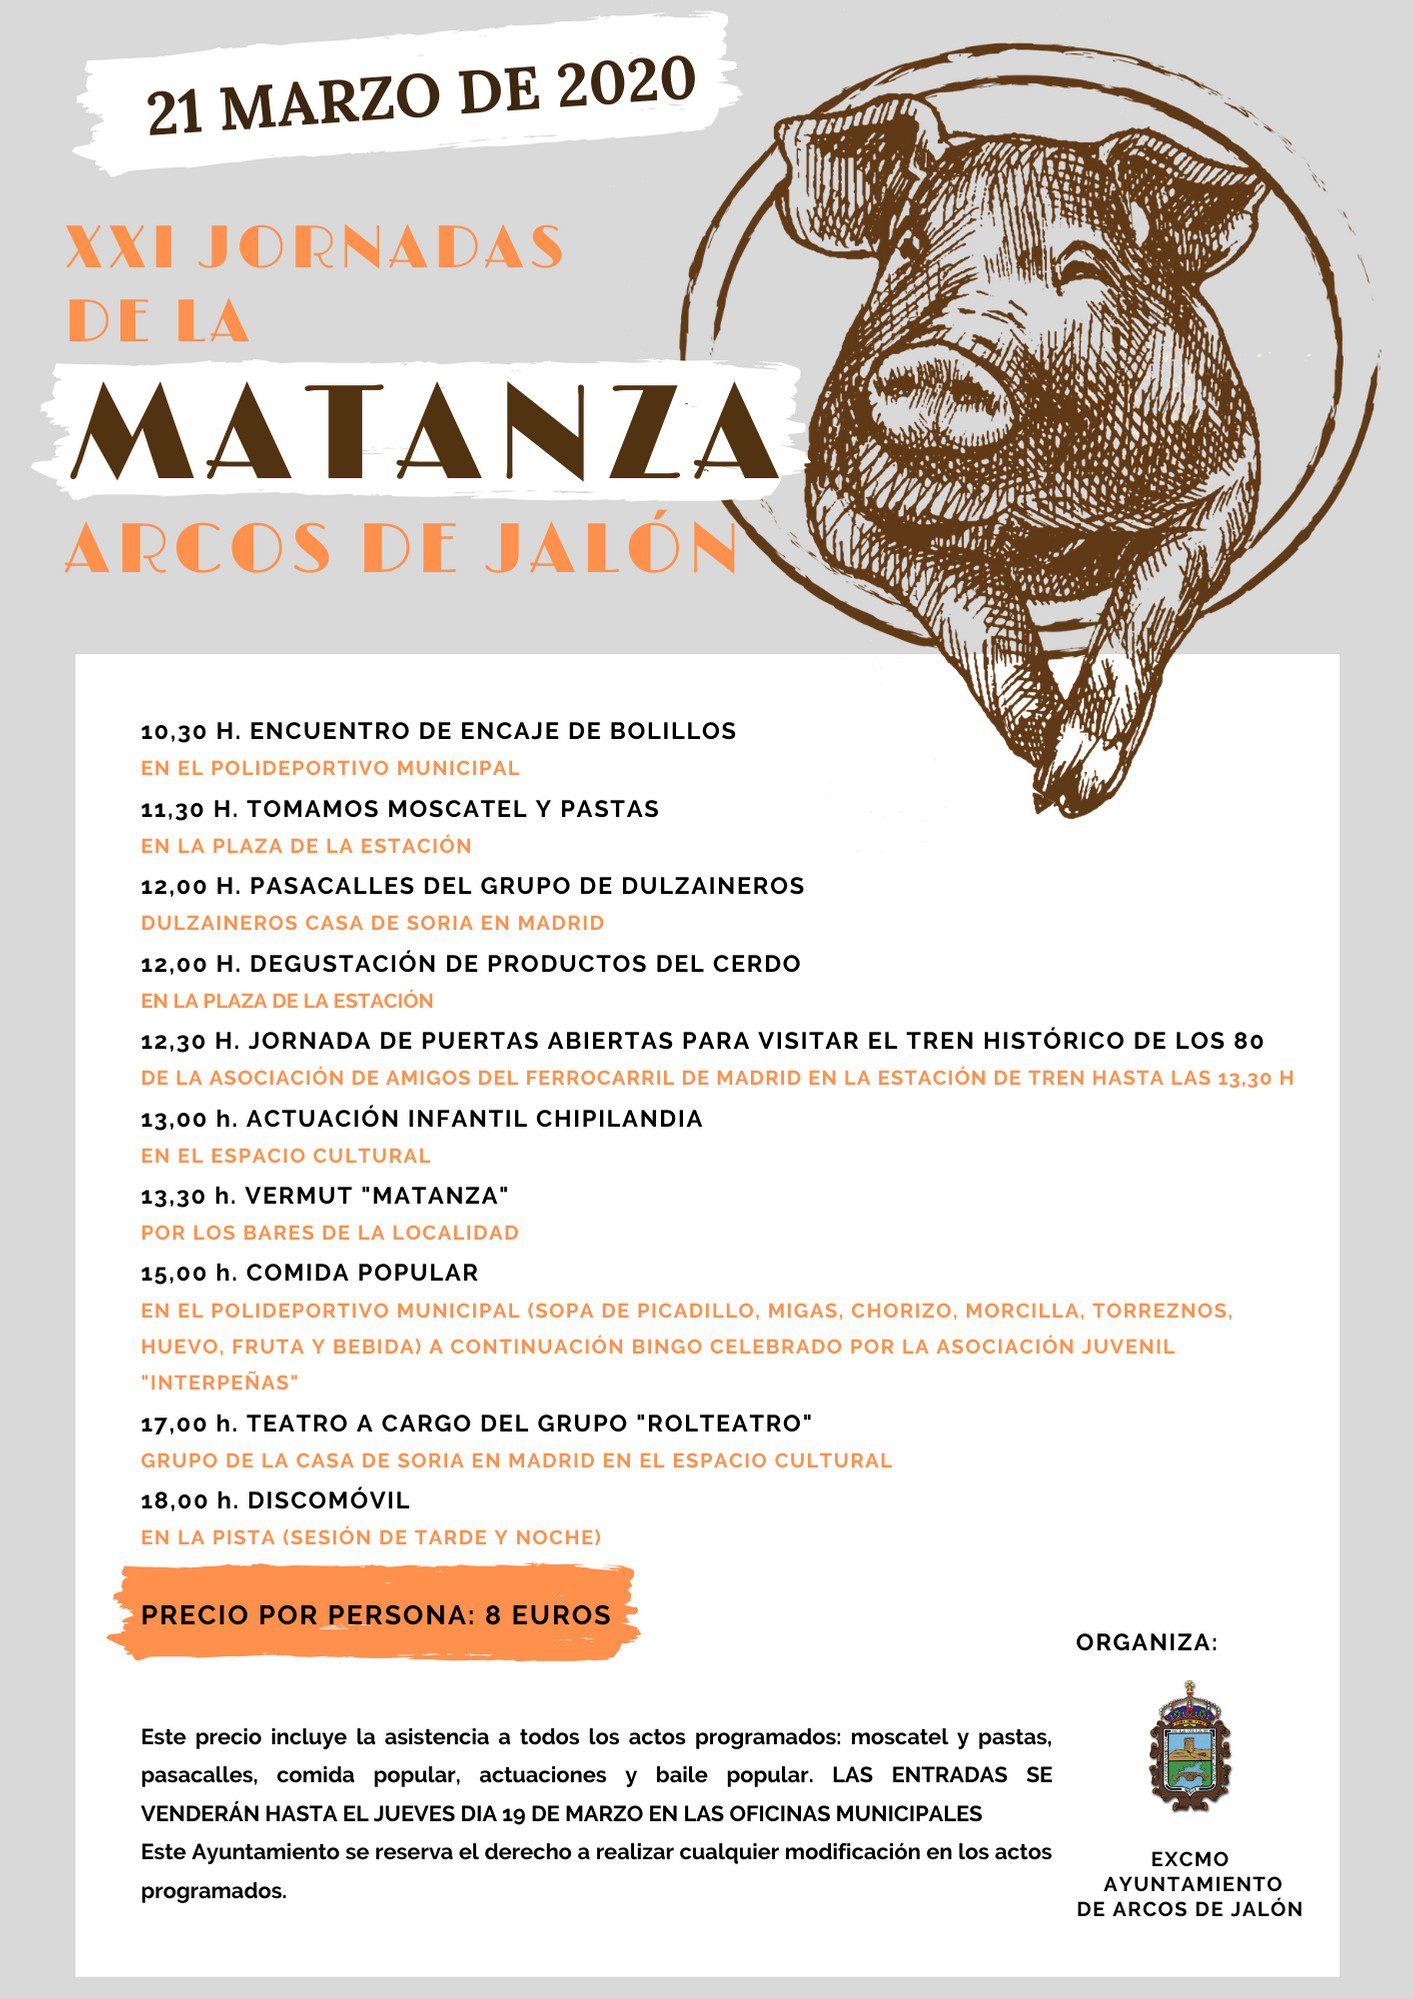 Programa de la XXI Jornada de la matanza en Arcos de Jalón